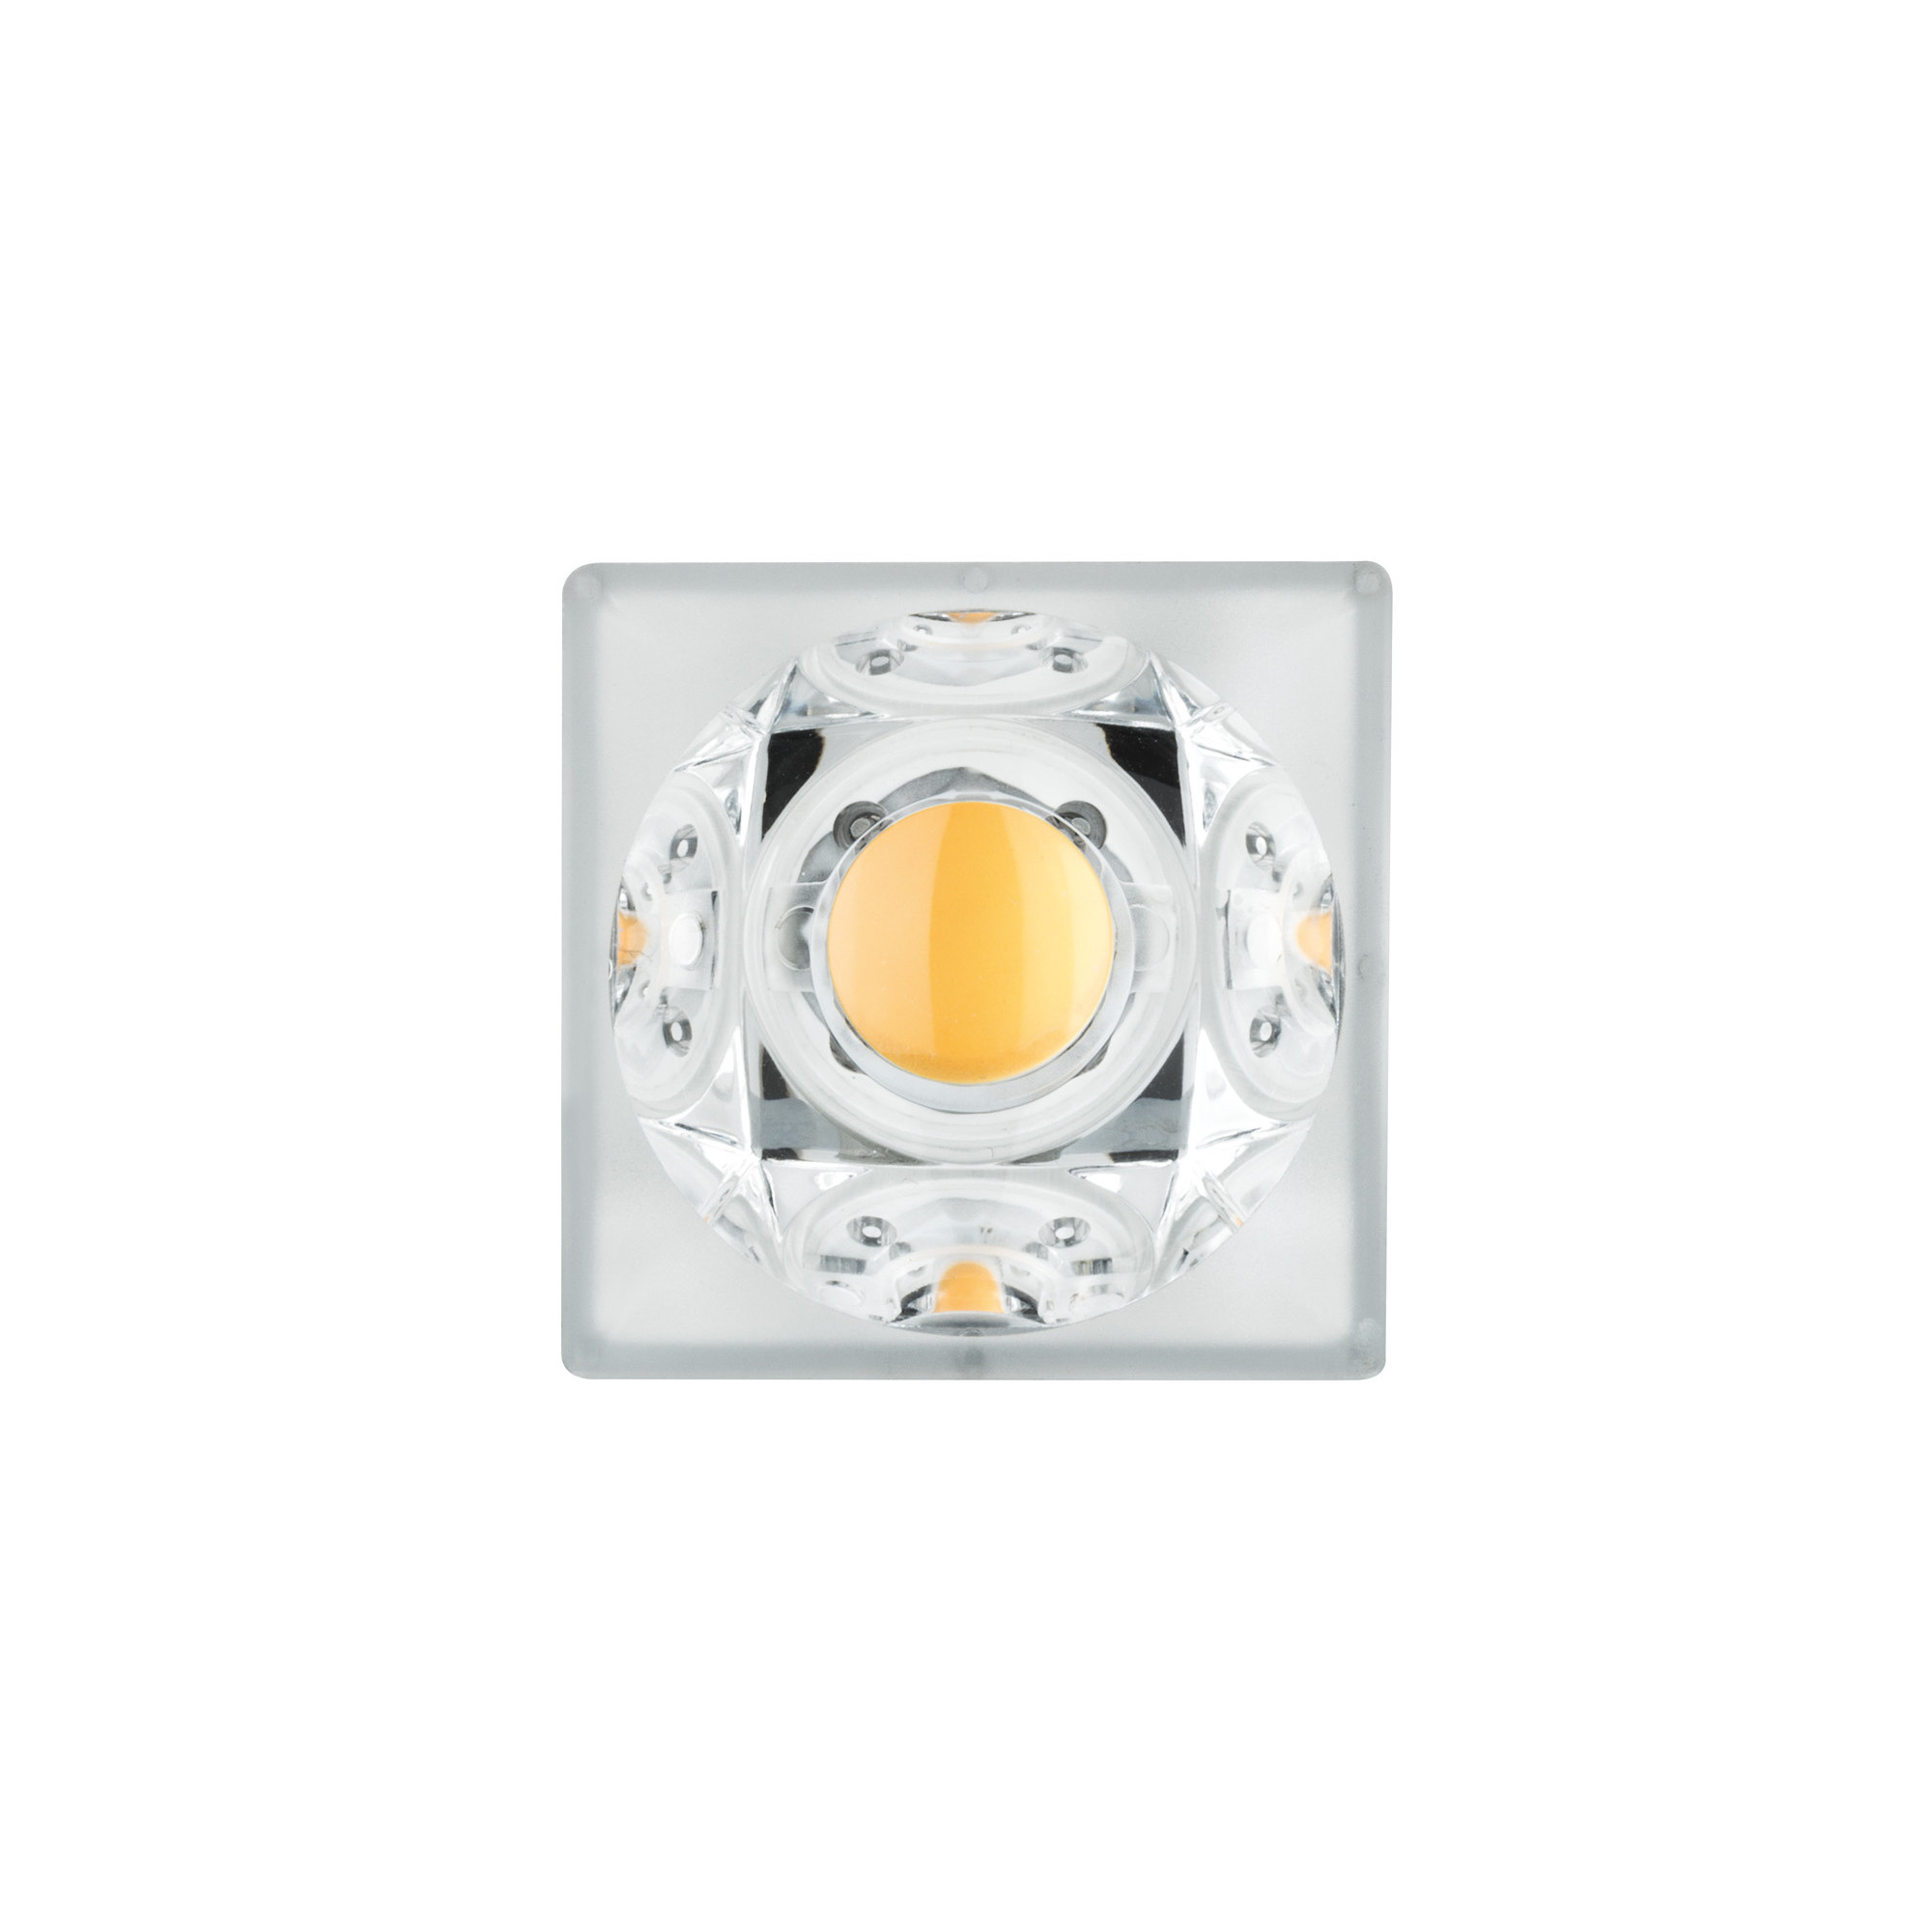 Лампа светодиодная Paulmann 28325 GU5.3 250 Лм теплый свет